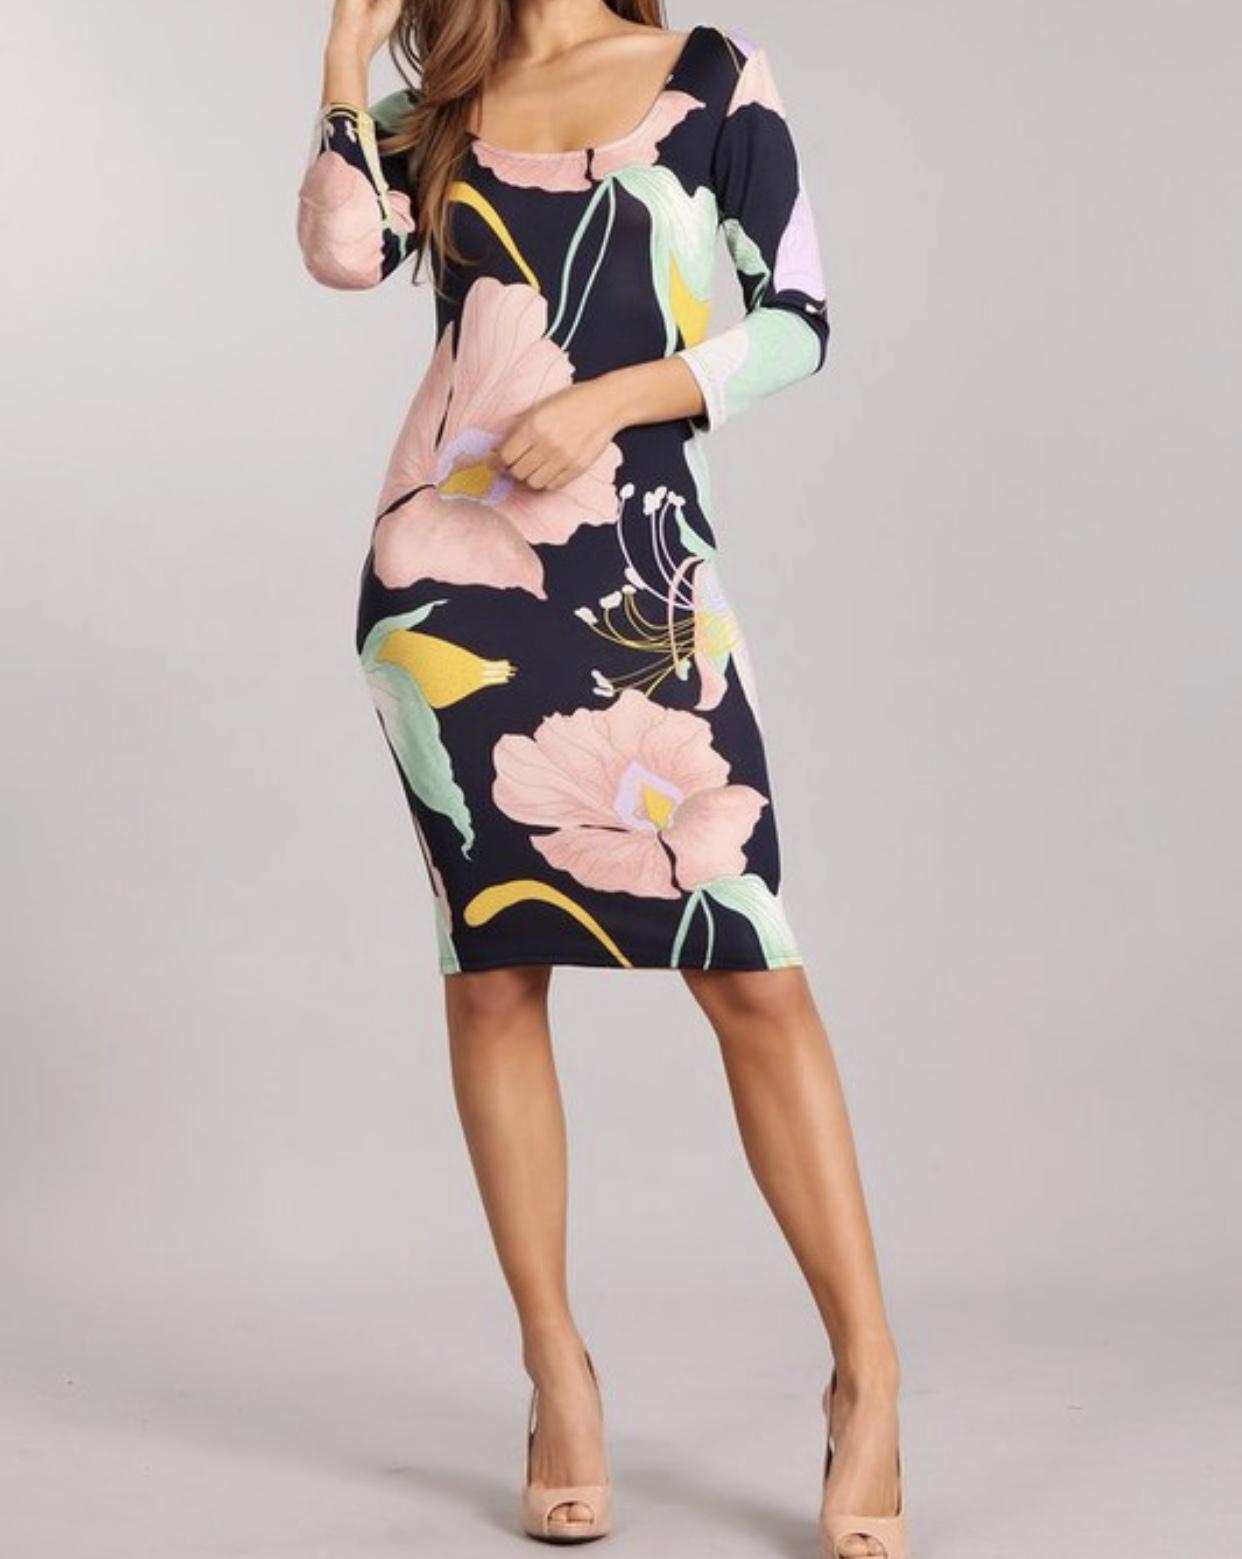 Blush & Blossom Dress UPDR708-BLUSHBLOSSOM